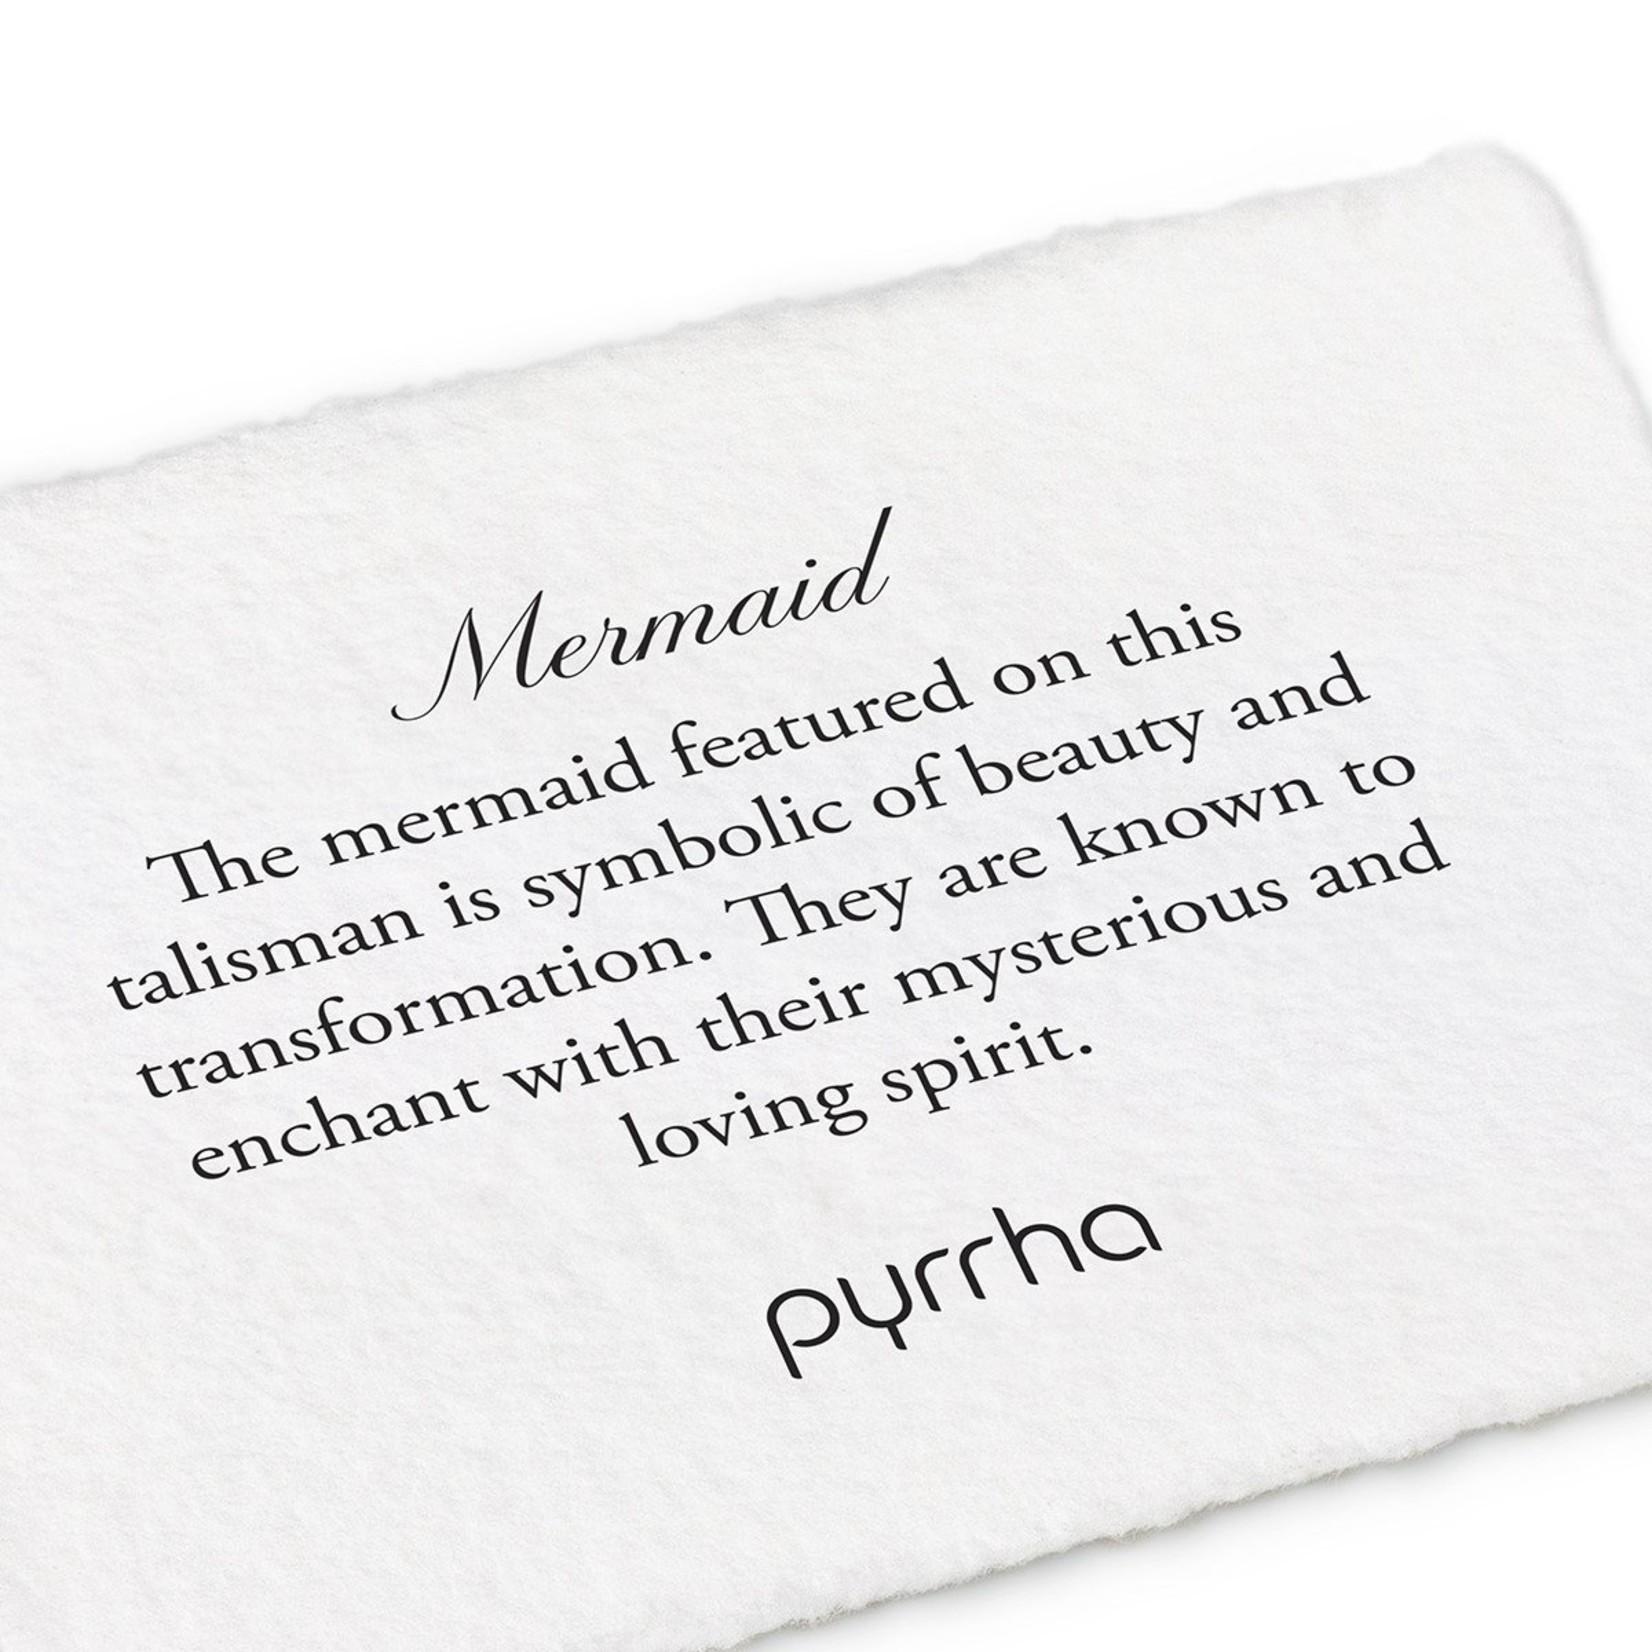 Pyrrha Mermaid Signature Talisman